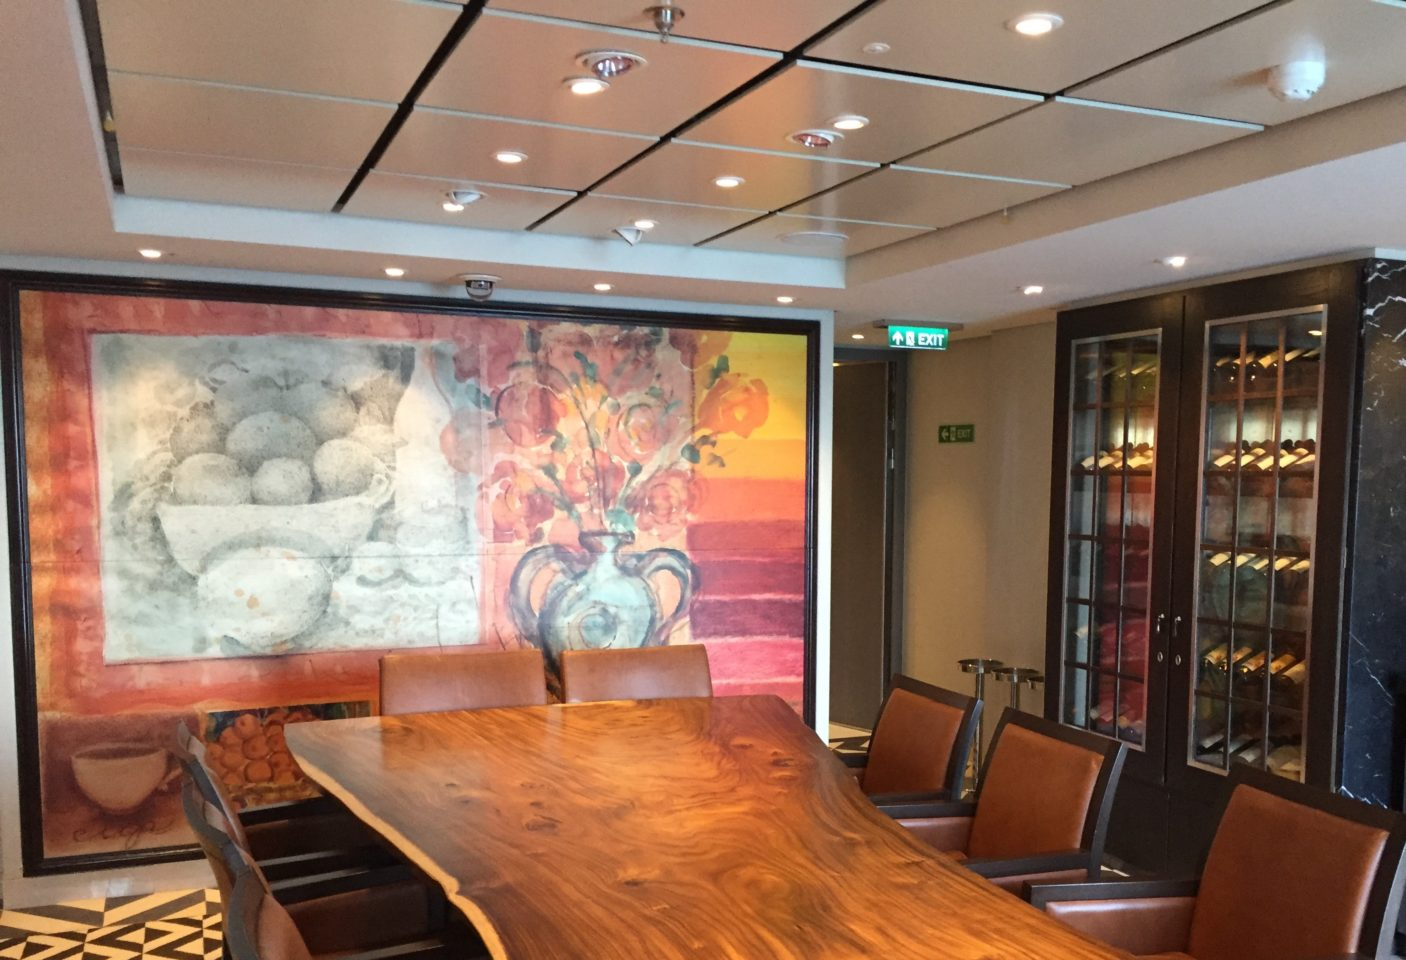 <em><strong>Viking Ocean Cruise Ships ~</strong> </em> Fabulous art at every turn on the <em><strong>Viking Star</strong></em>